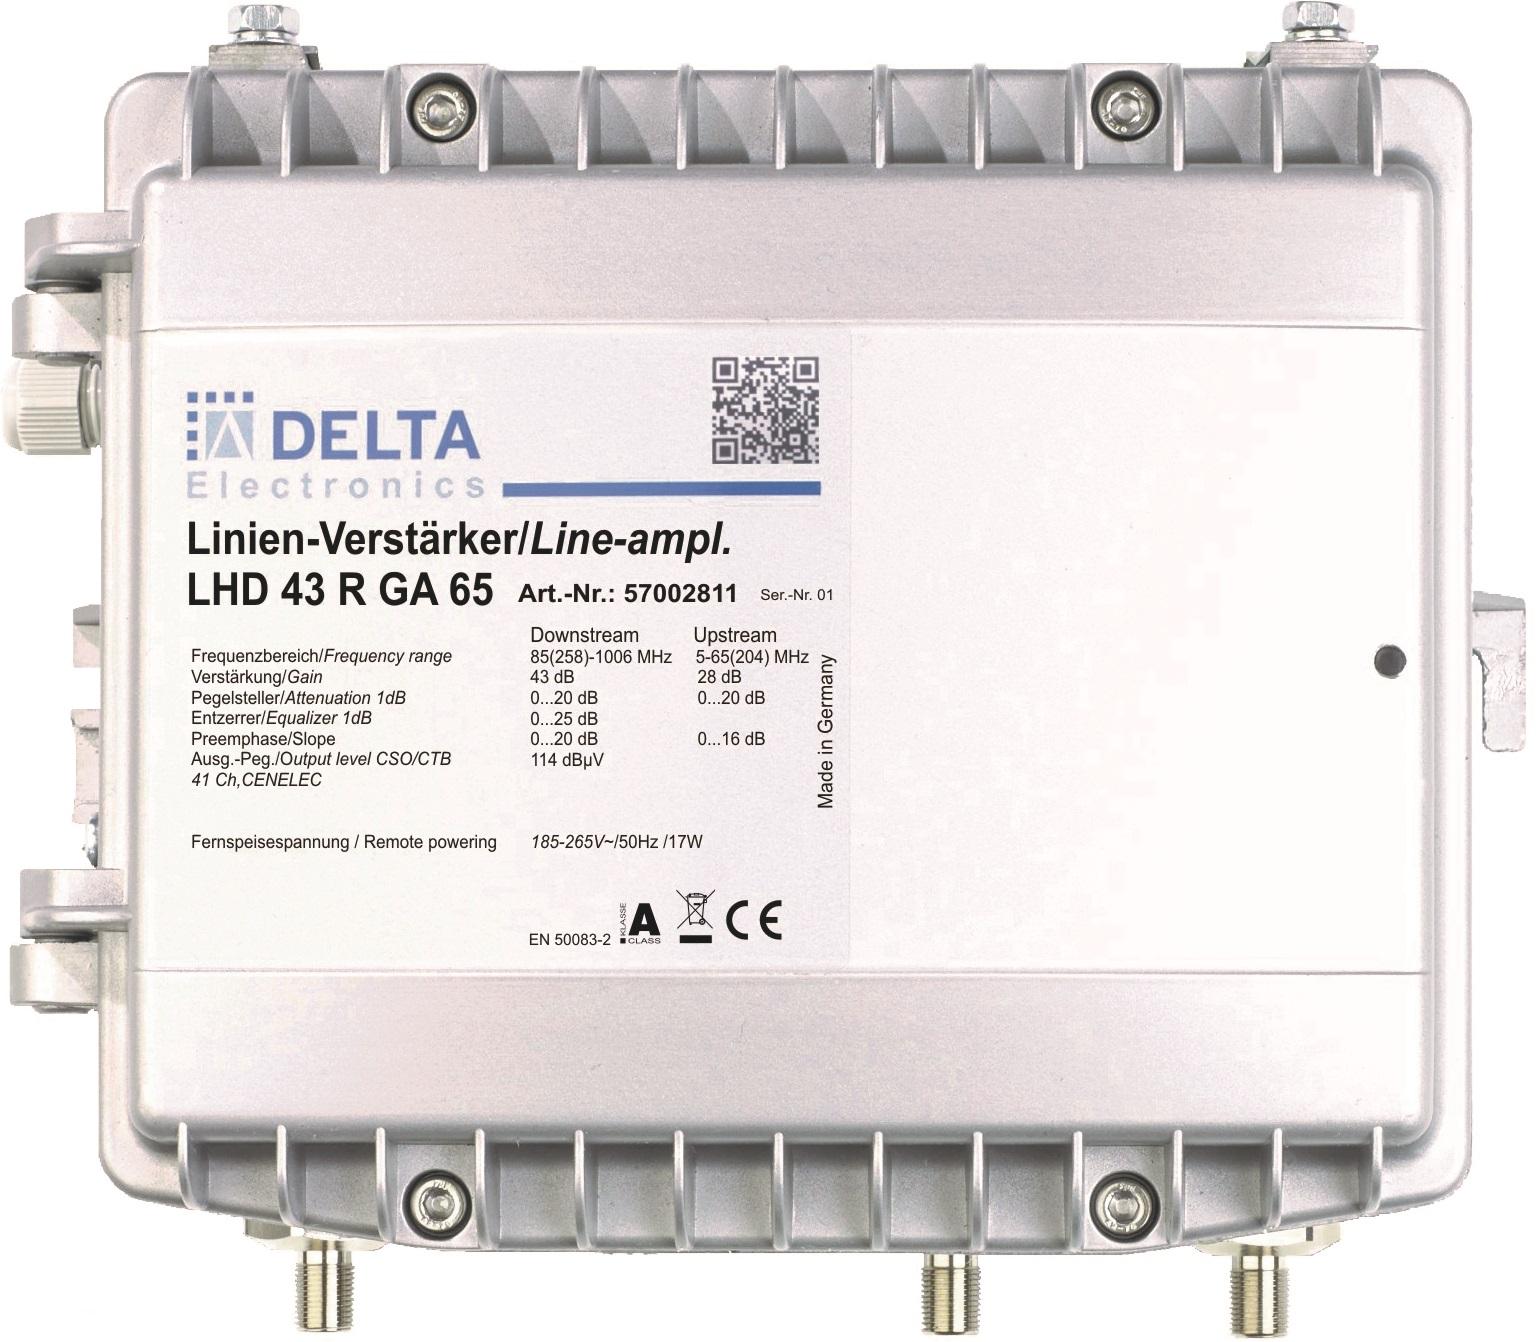 LHD 43 GA Linienverstärker 1,2 GHz modular